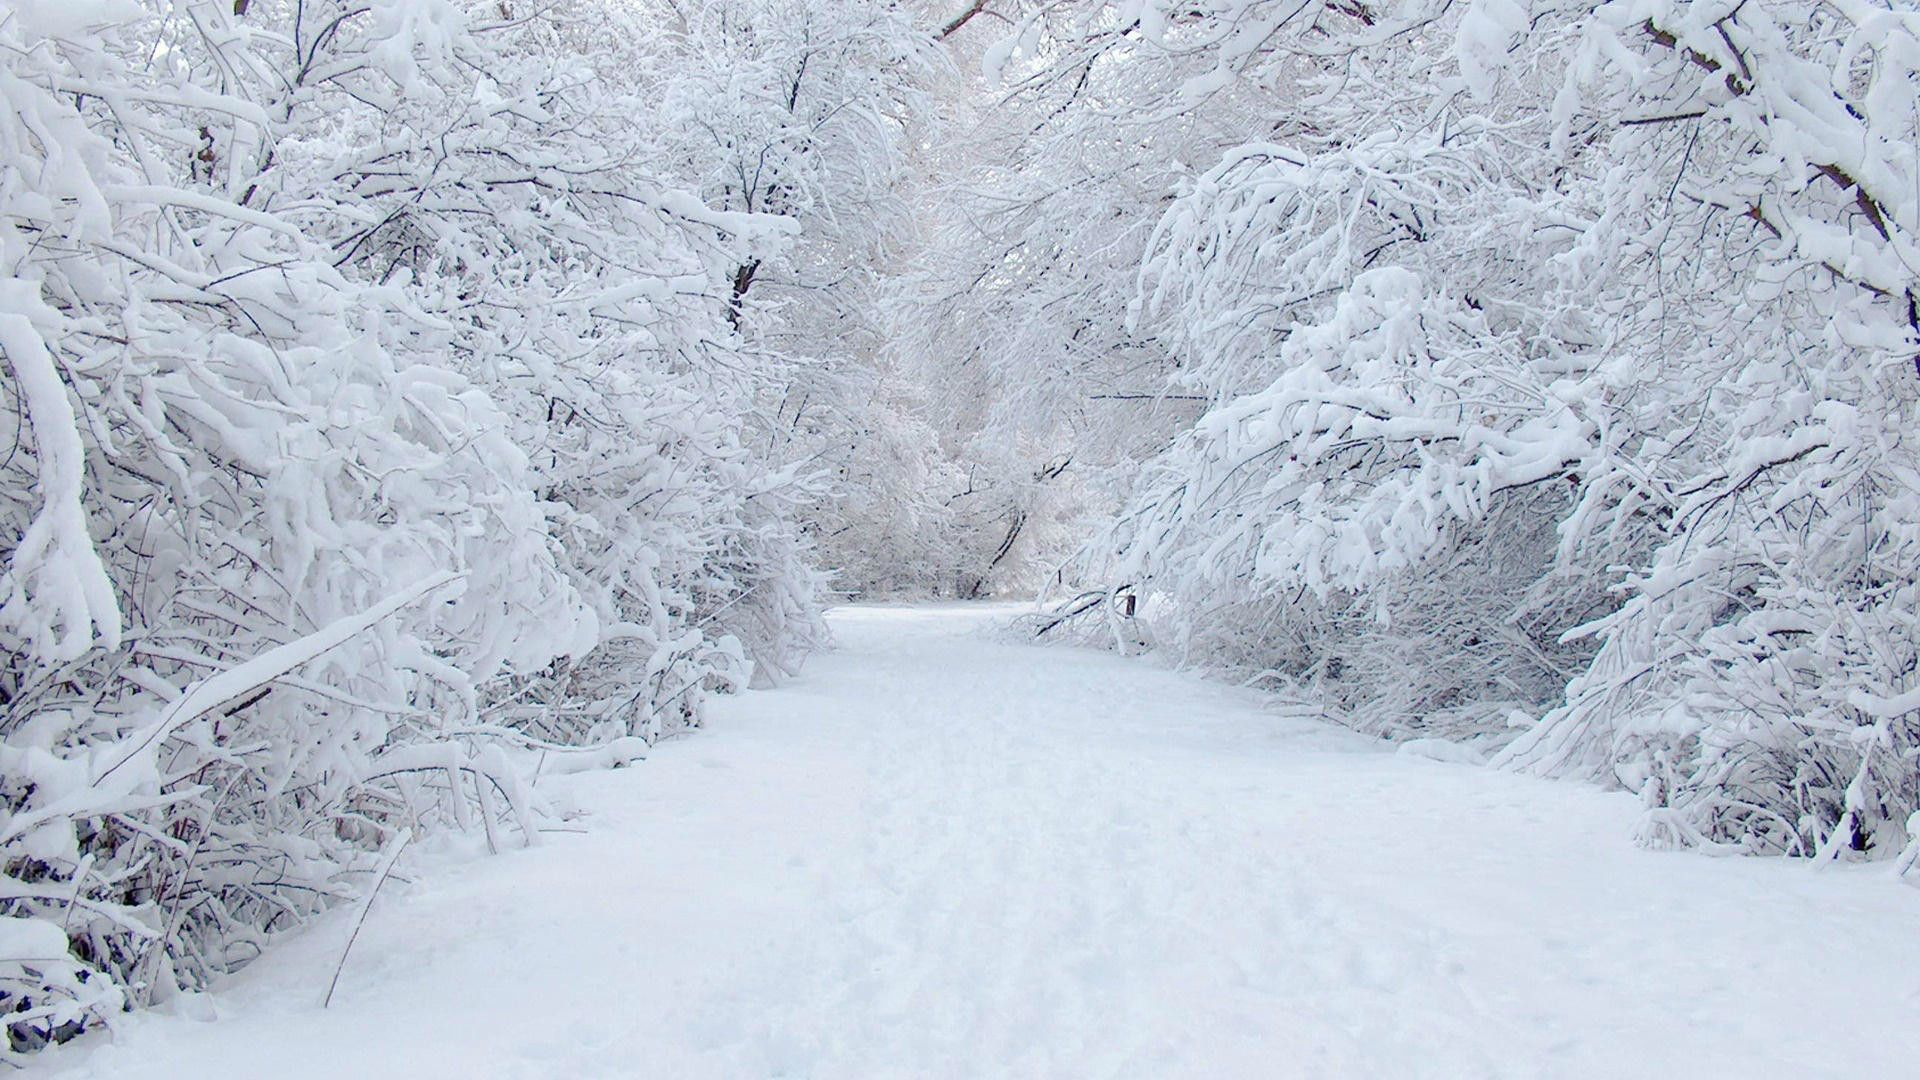 Snow Wallpapers HD - Wallpaper Cave